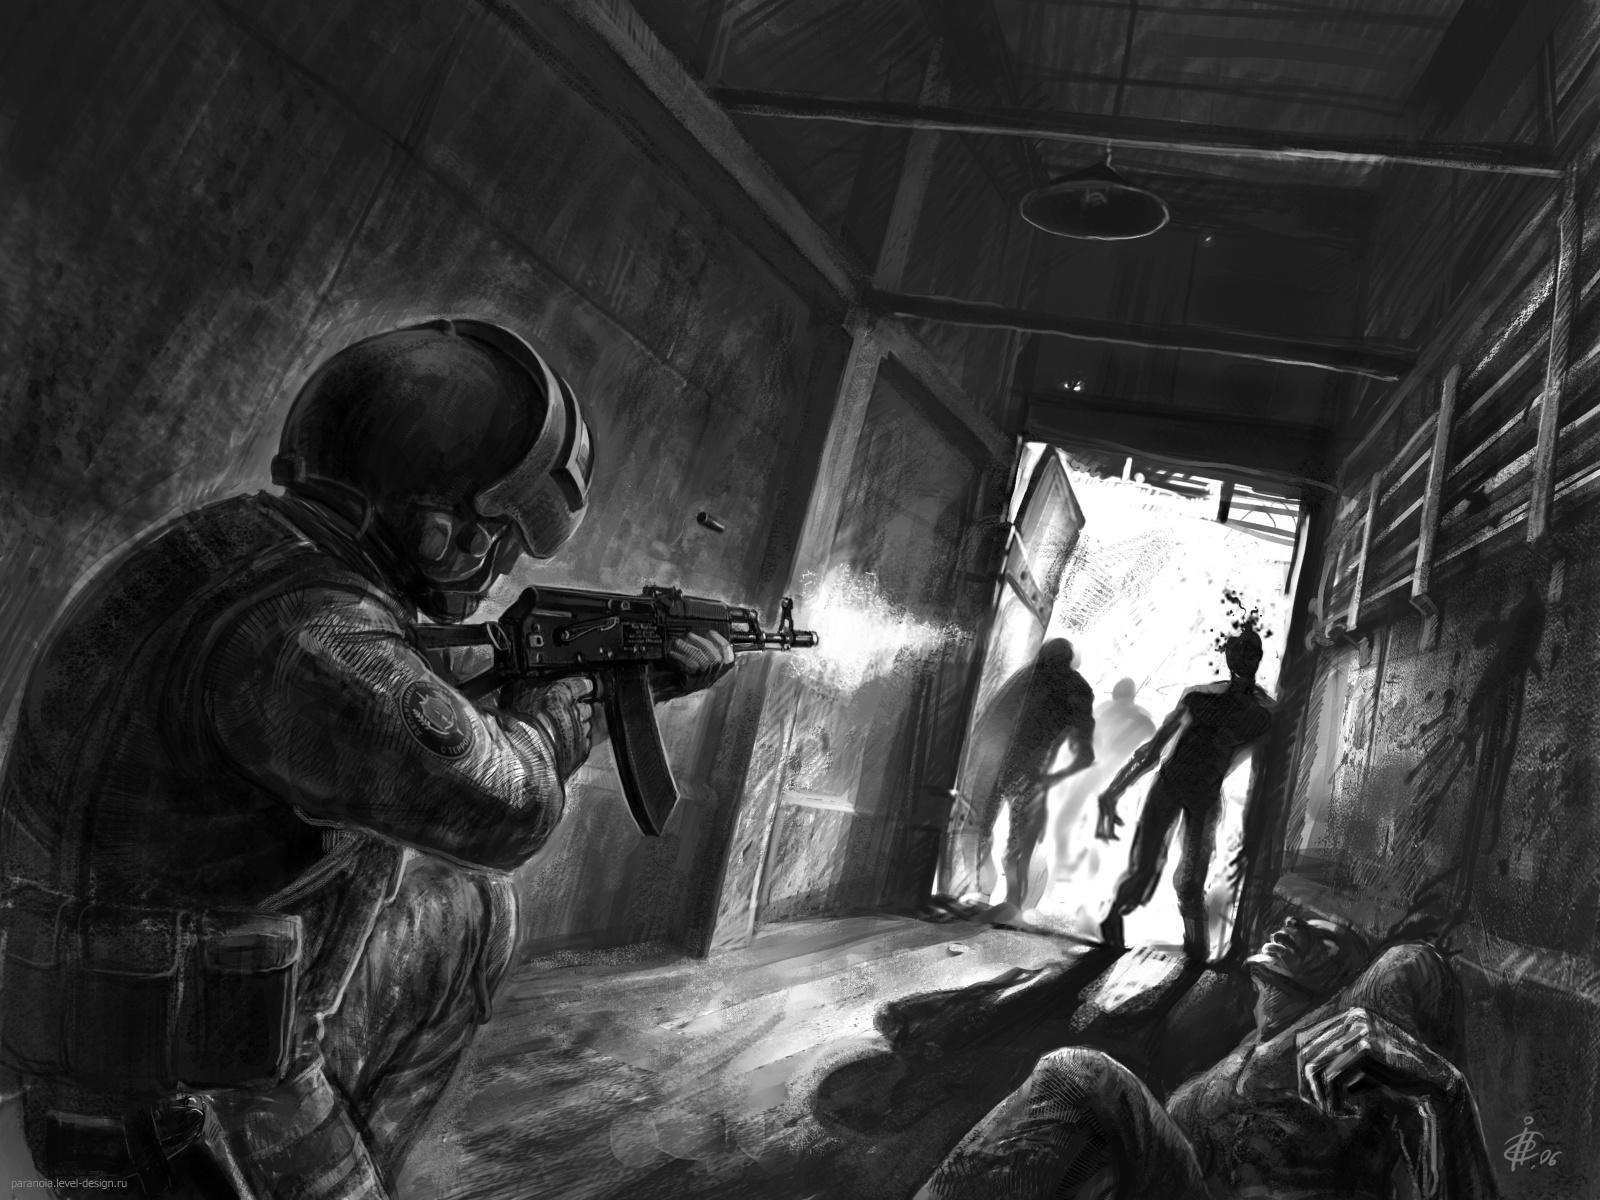 Wallpapers de zombies HD - Taringa!